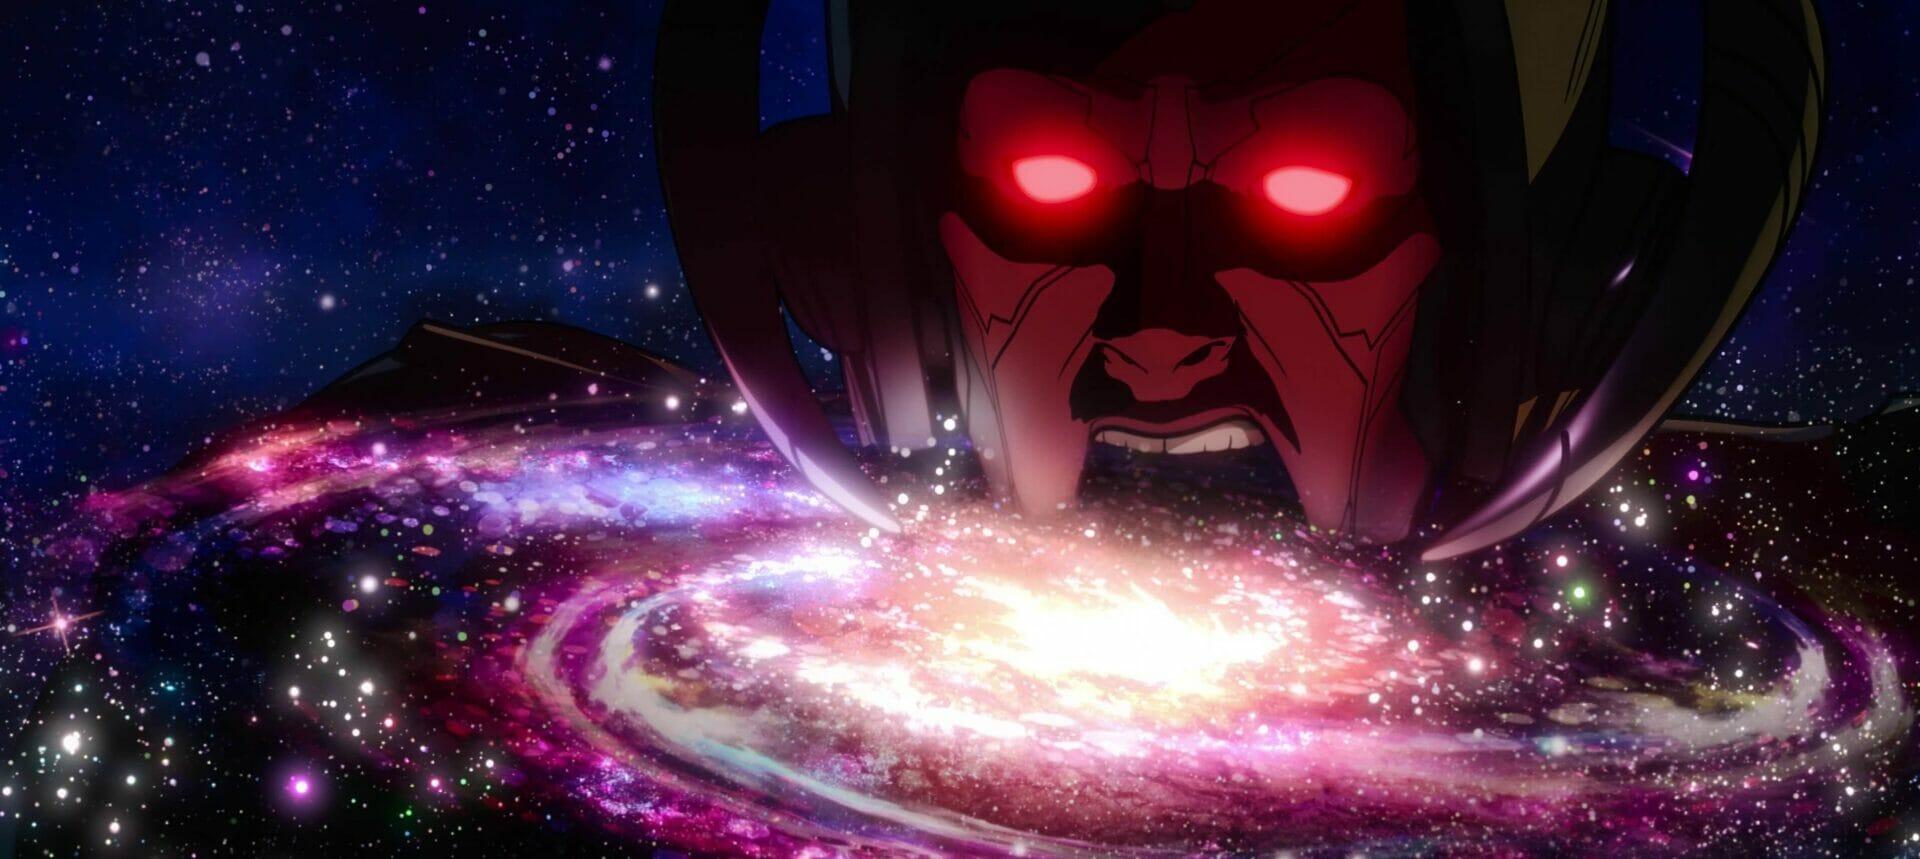 what if ultron referencia galactus legadodamarvel Vision Art NEWS